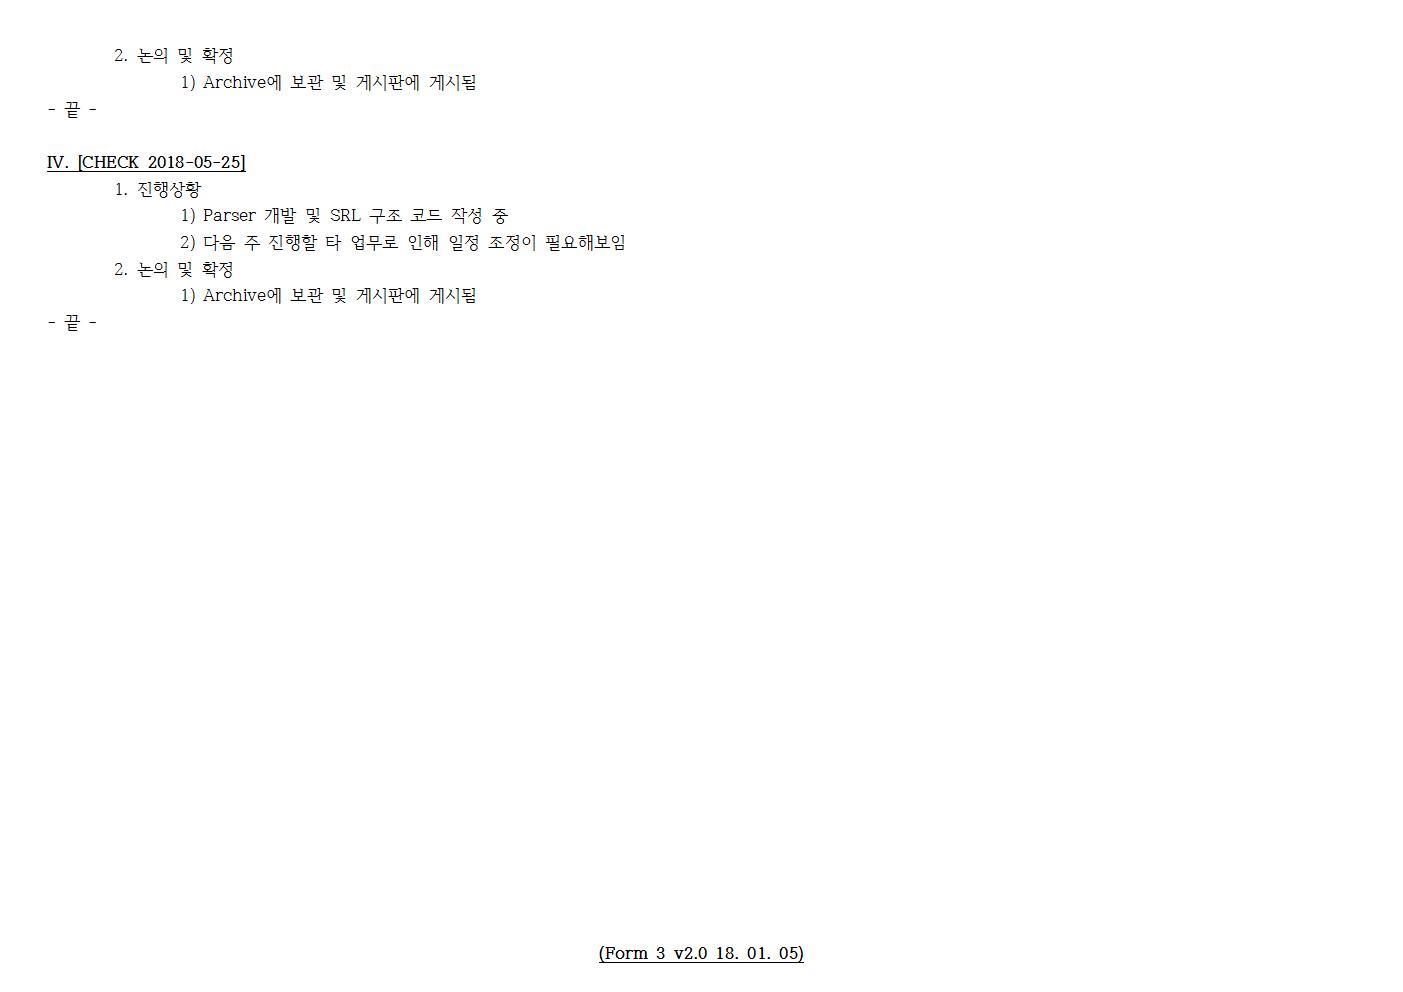 D-[18-001-RD-01]-[SAVE 3.0]-[2018-05-25][SH]003.jpg